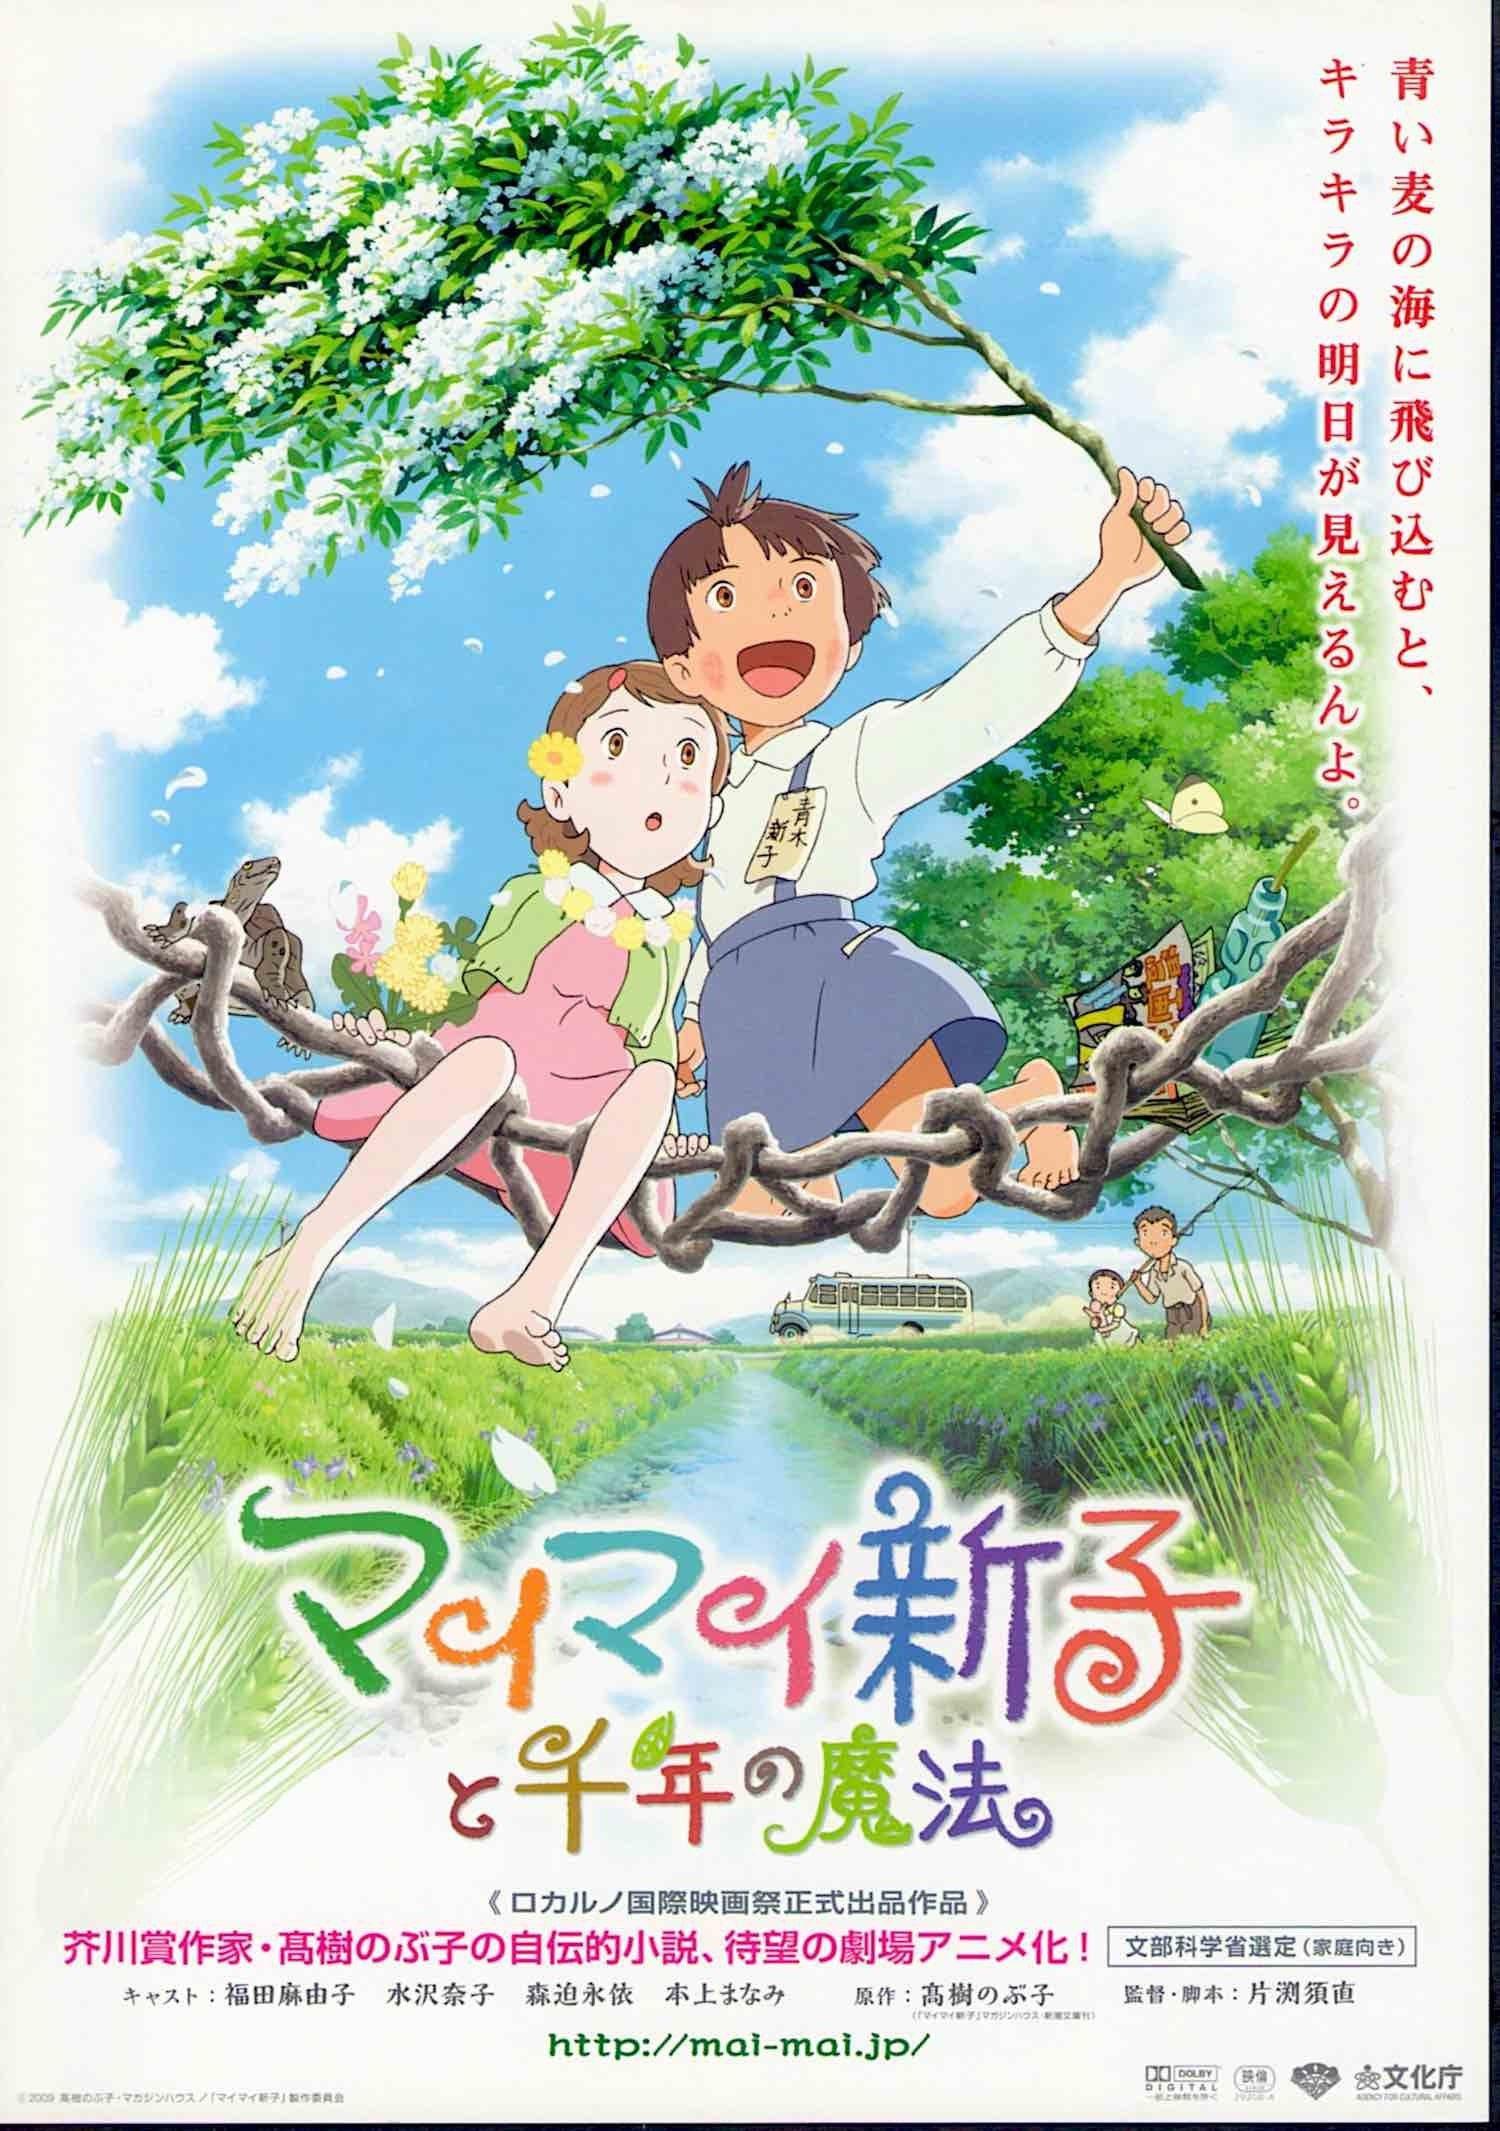 Mai Mai Miracle Japan Anime, Sunao Katabuchi 2009